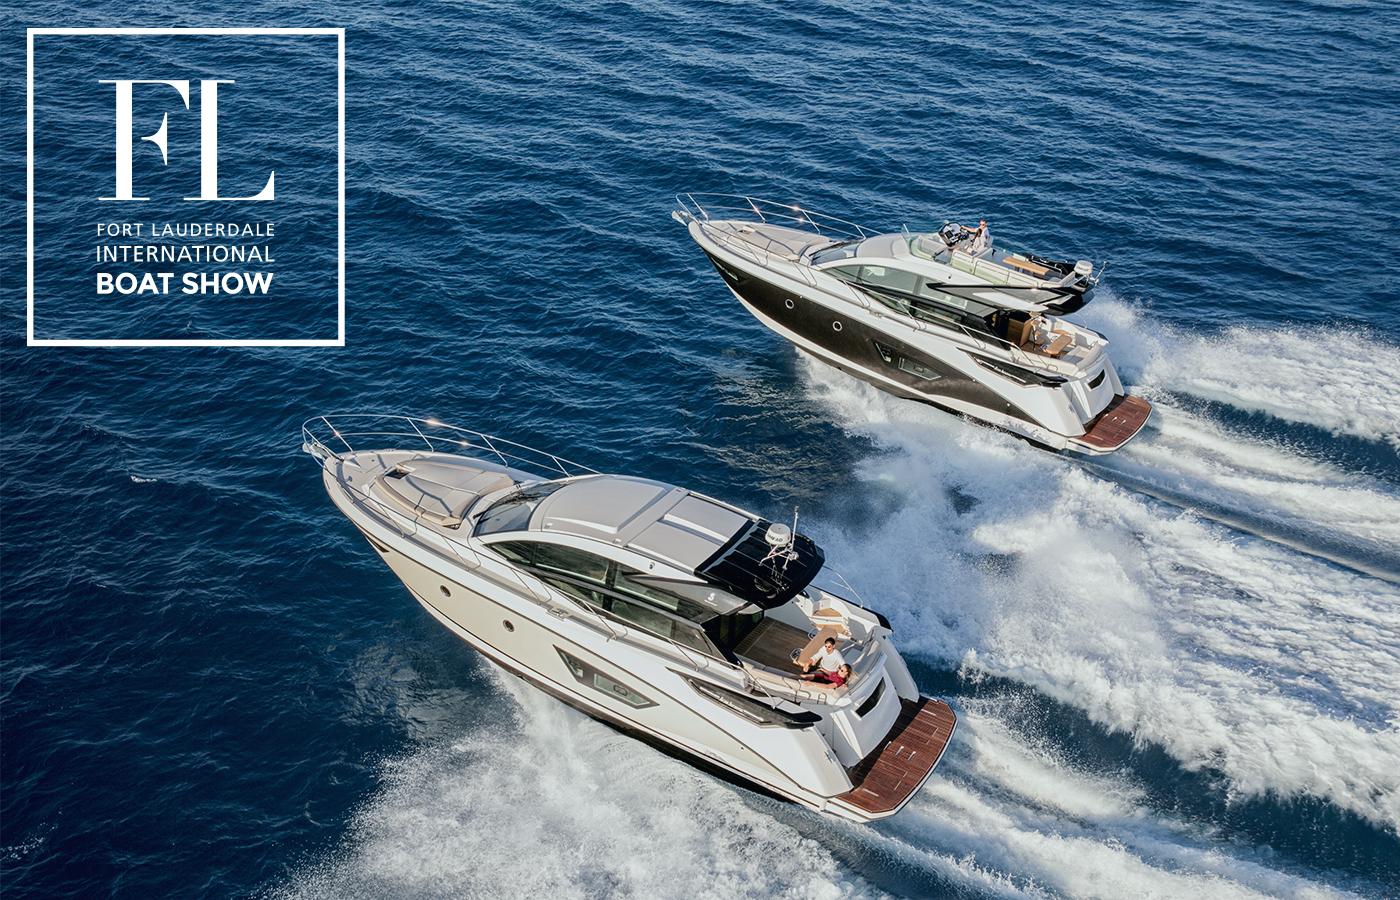 Beneteau Featured Yachts At FLIBS 2020 [GT, ST + MC Models]